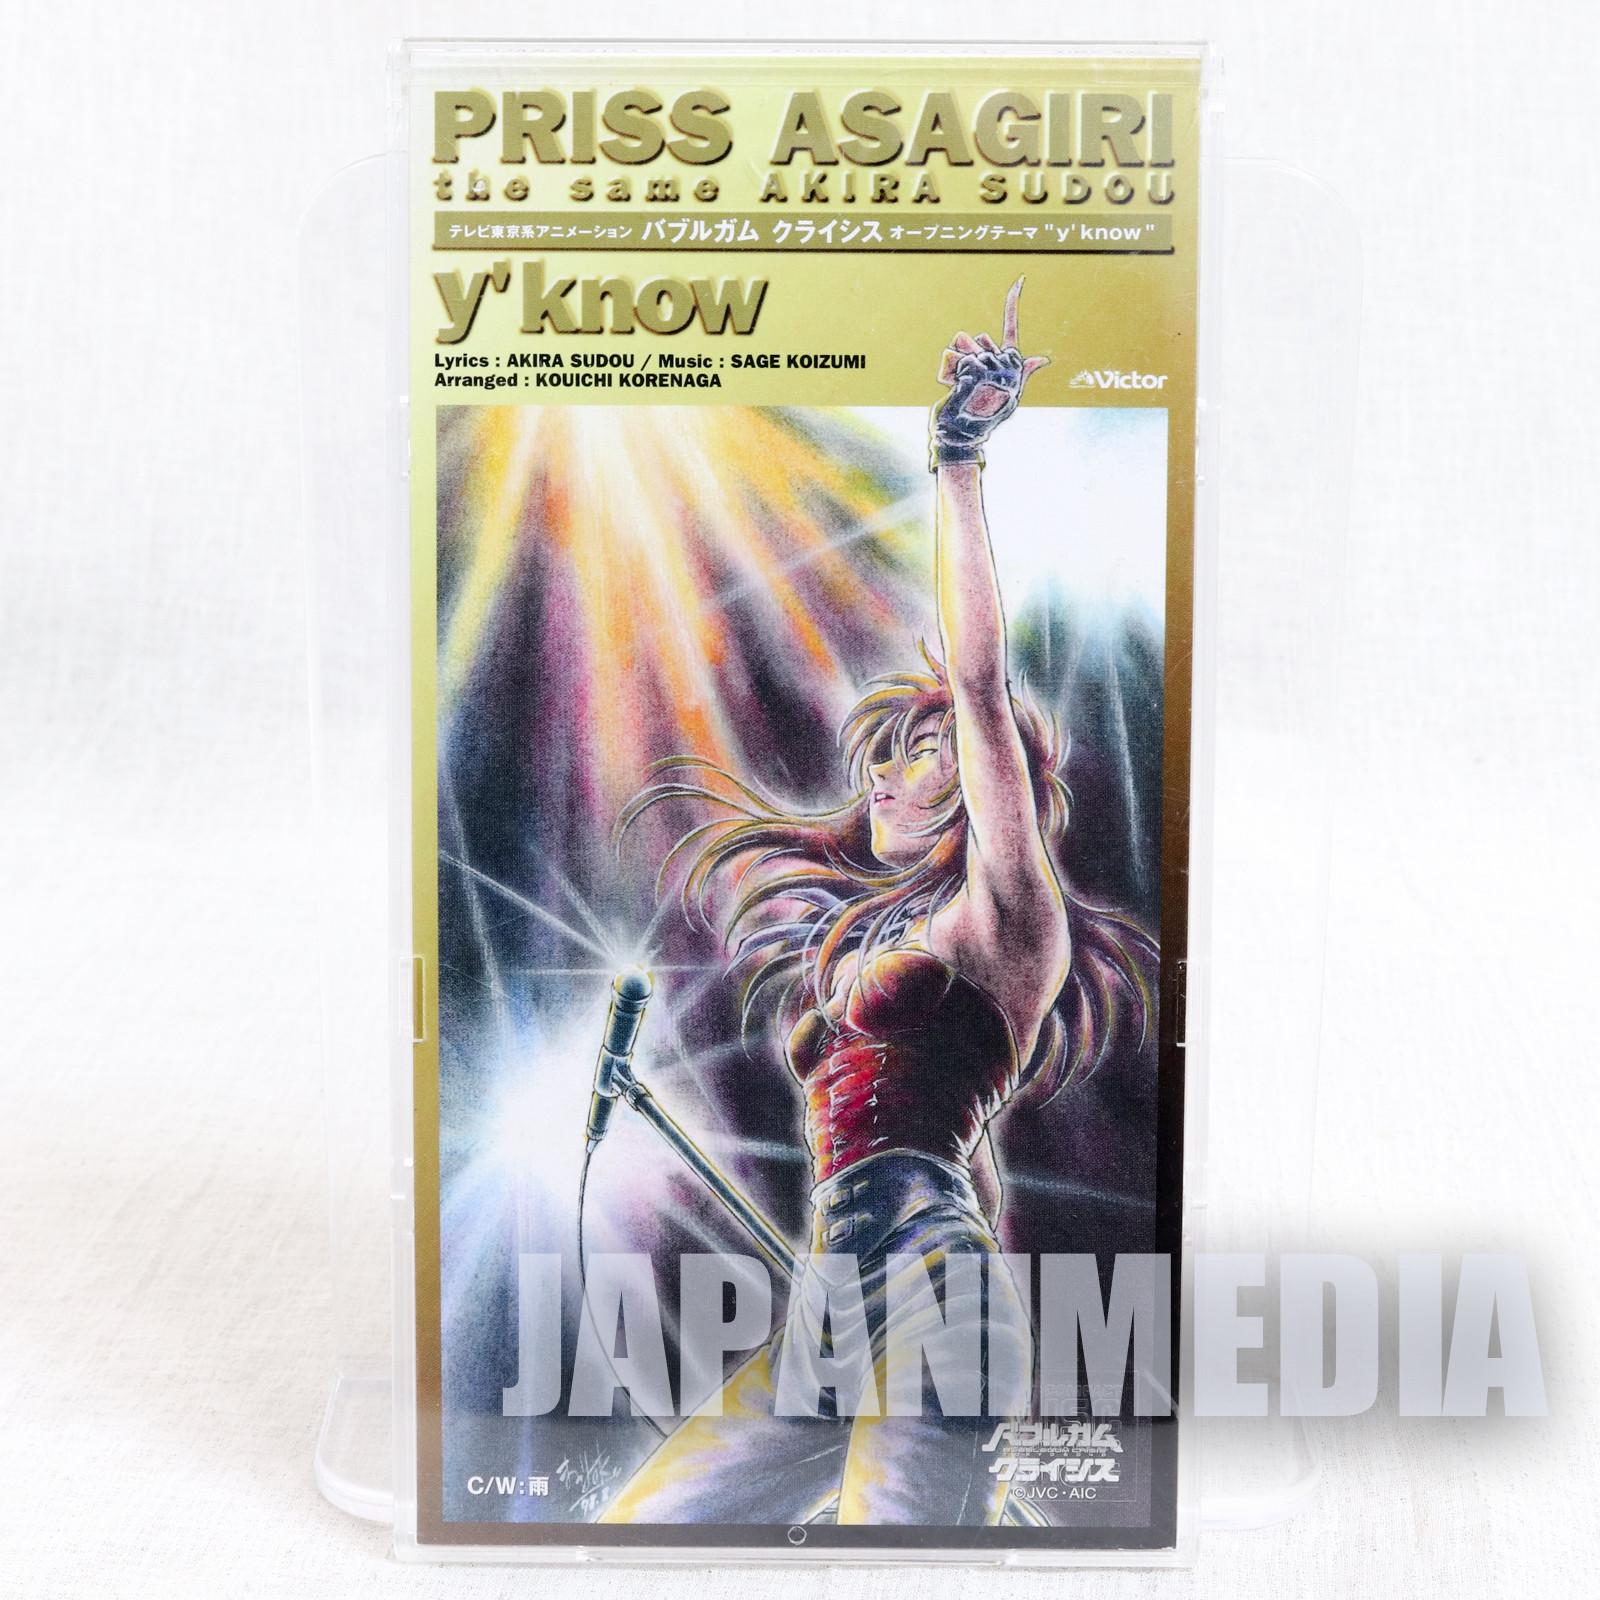 "Bubblegum Crisis Priss Asagiri ""Y' know"" 3 inch 8cm JAPAN CD ANIME"